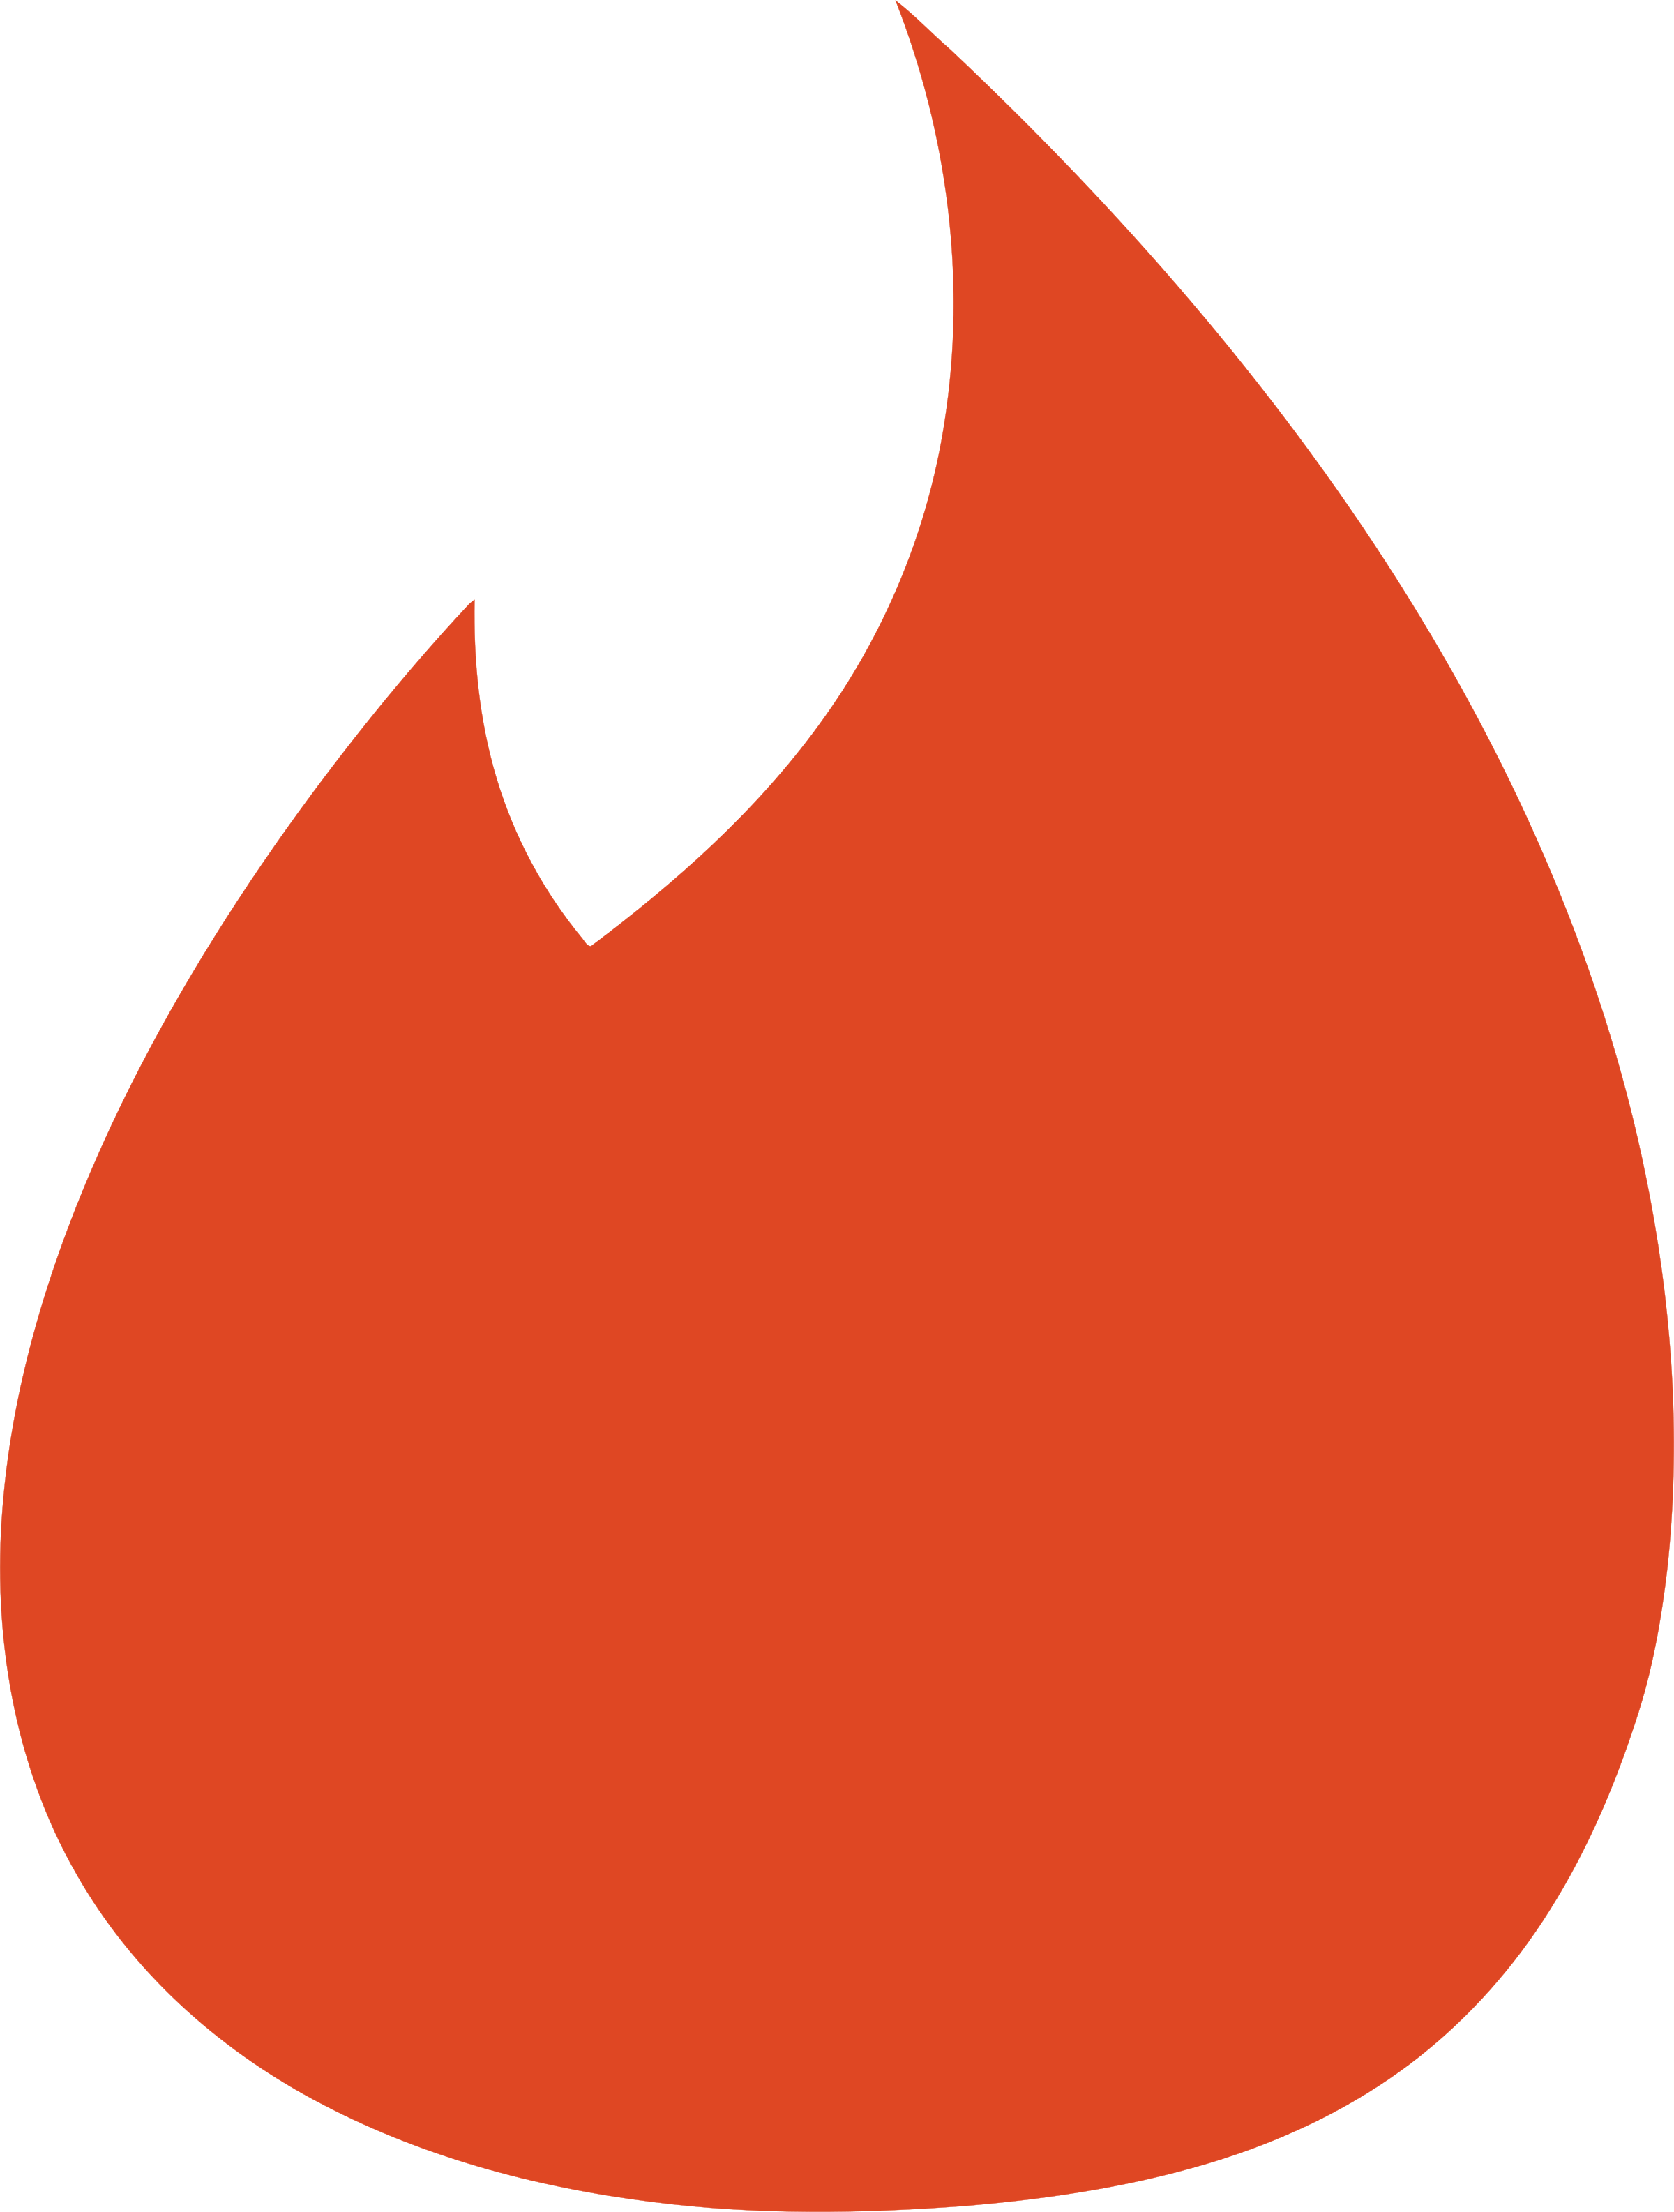 Tinder icon Logo PNG Transparent & SVG Vector - Freebie Supply